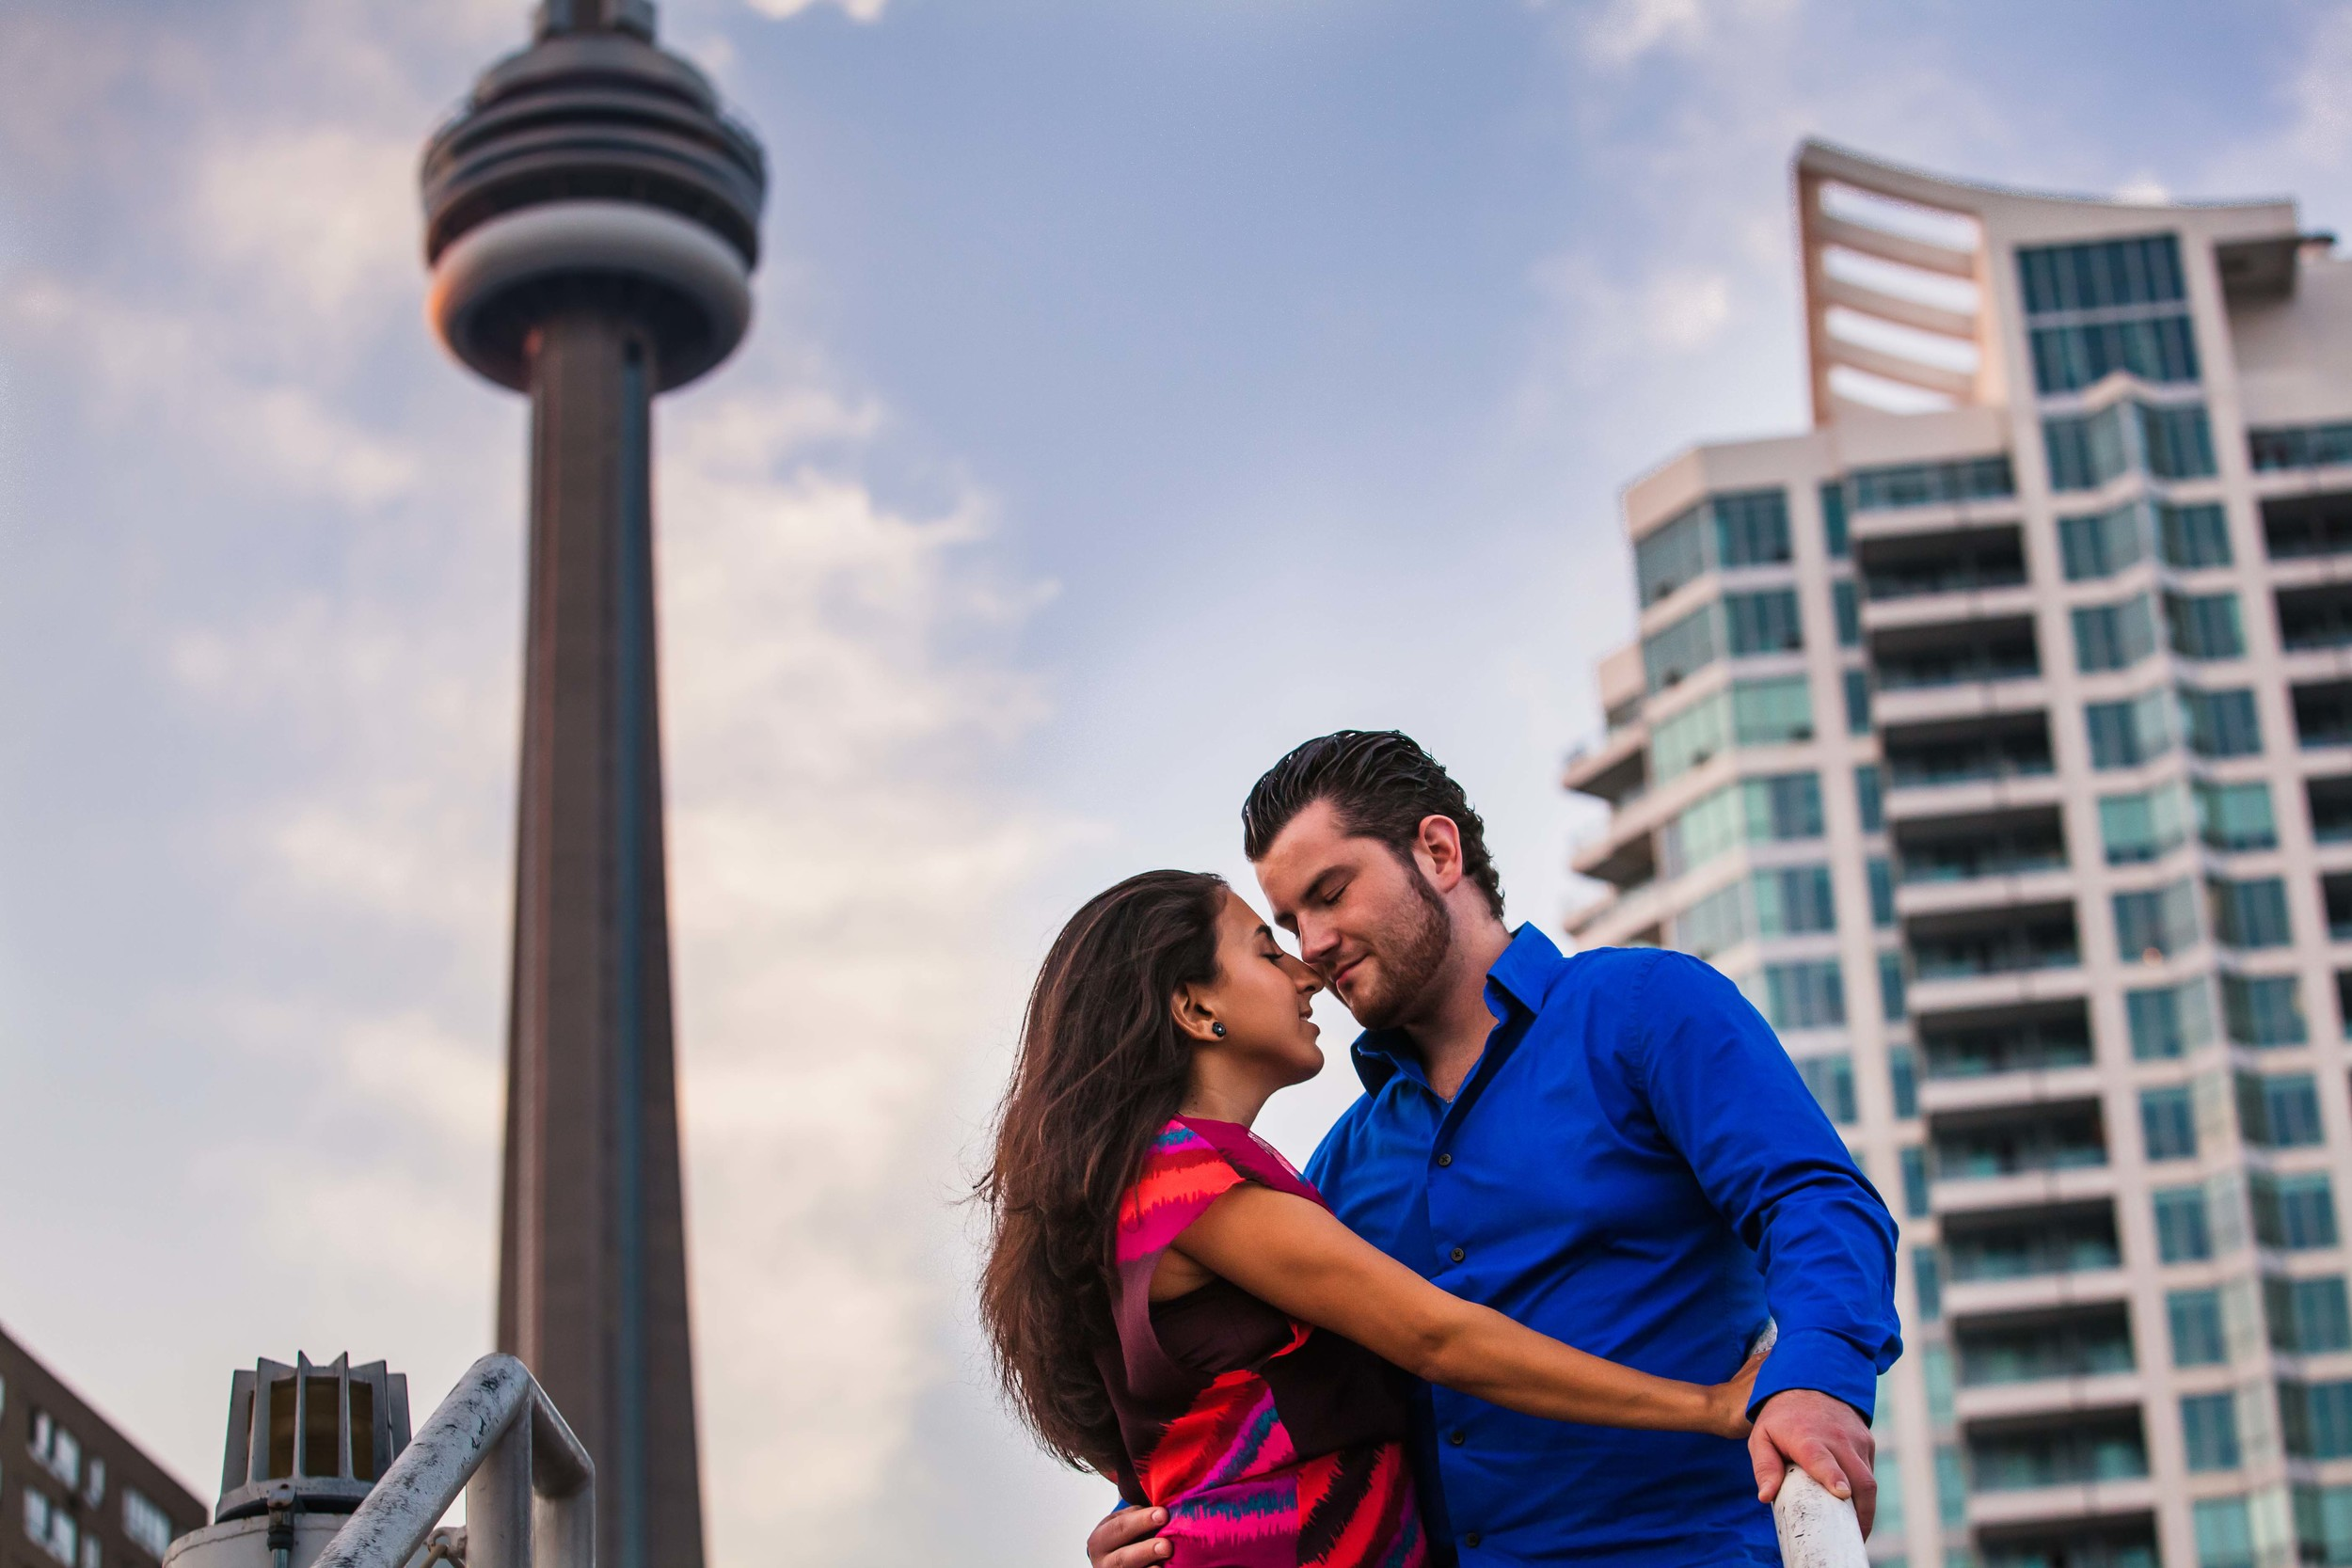 Toronto_Wedding_Photography_Steph&Kyle_eng-9